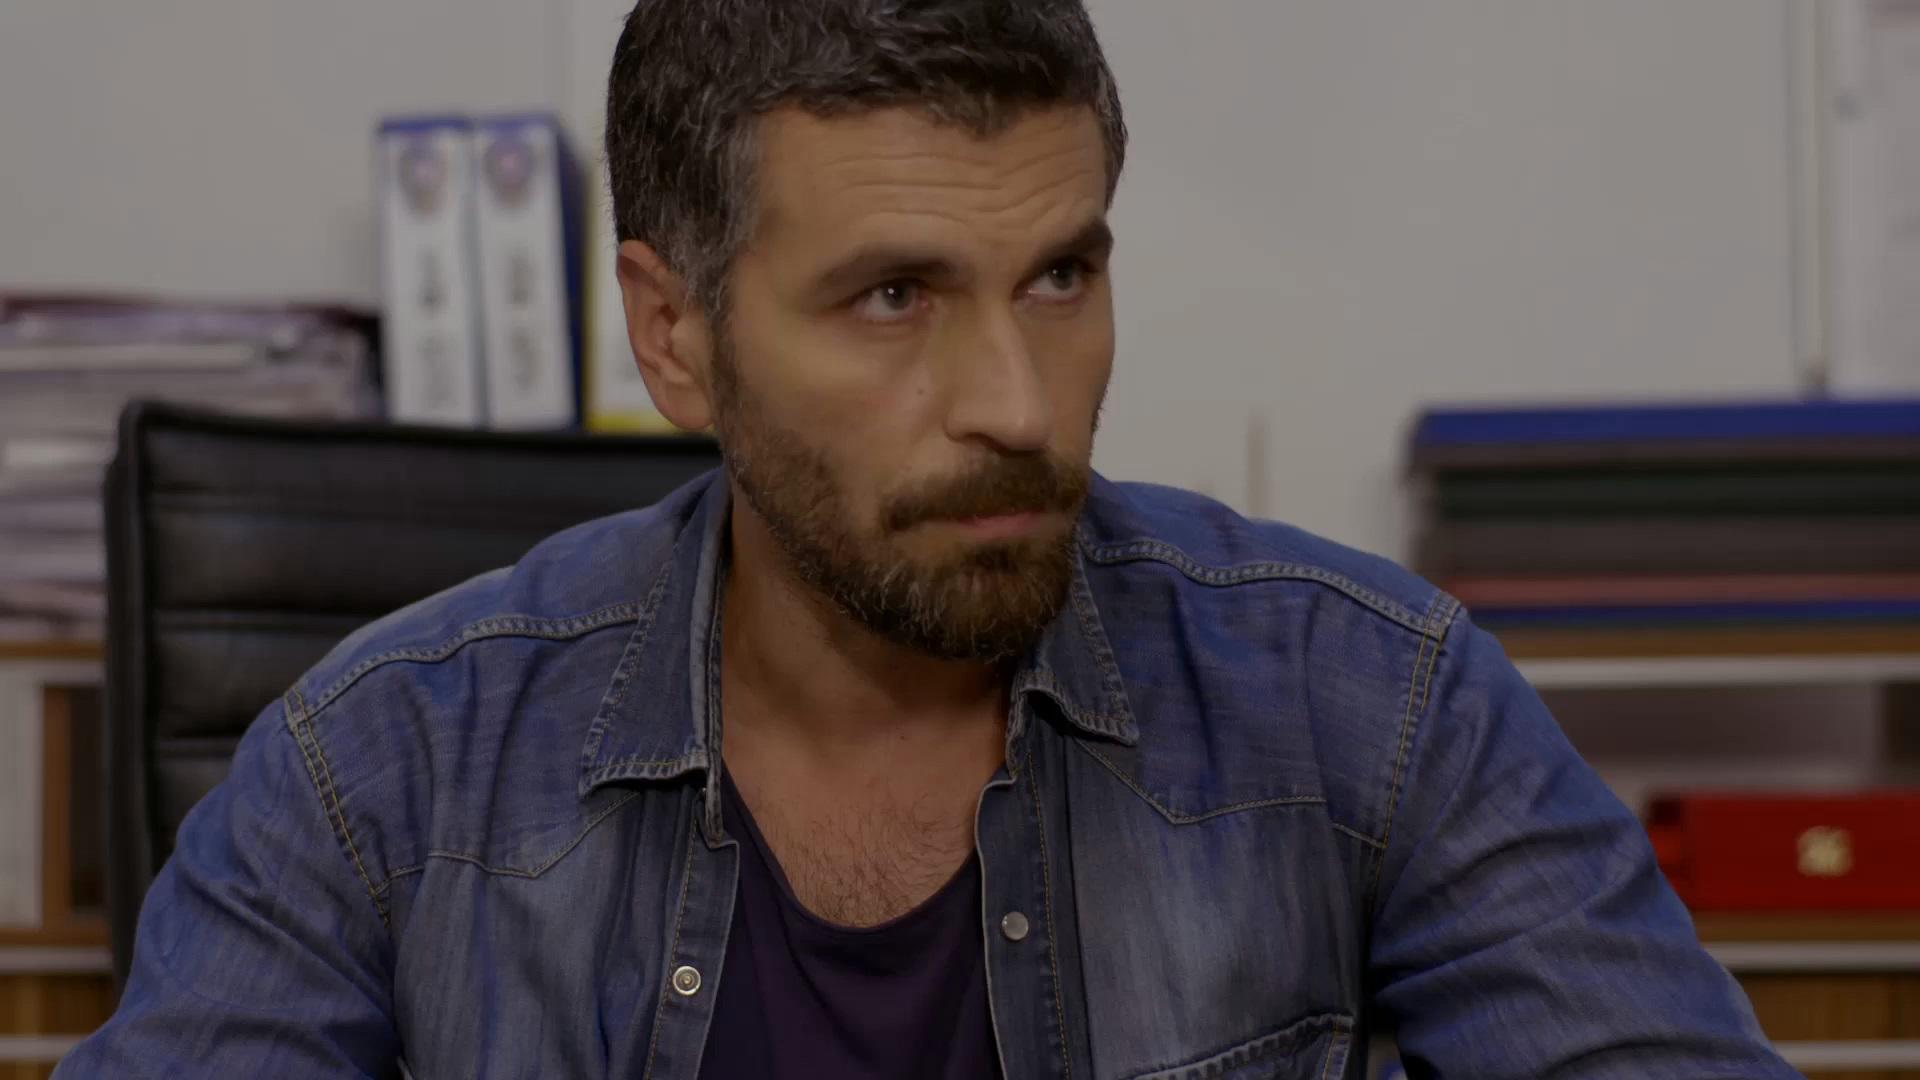 45-25: #KusursuzCinayet | 2019 | Yerli Film | WEB-DL | XviD | Sansürsüz | 1080p - m720p - m1080p | WEB-DL | Tek Link